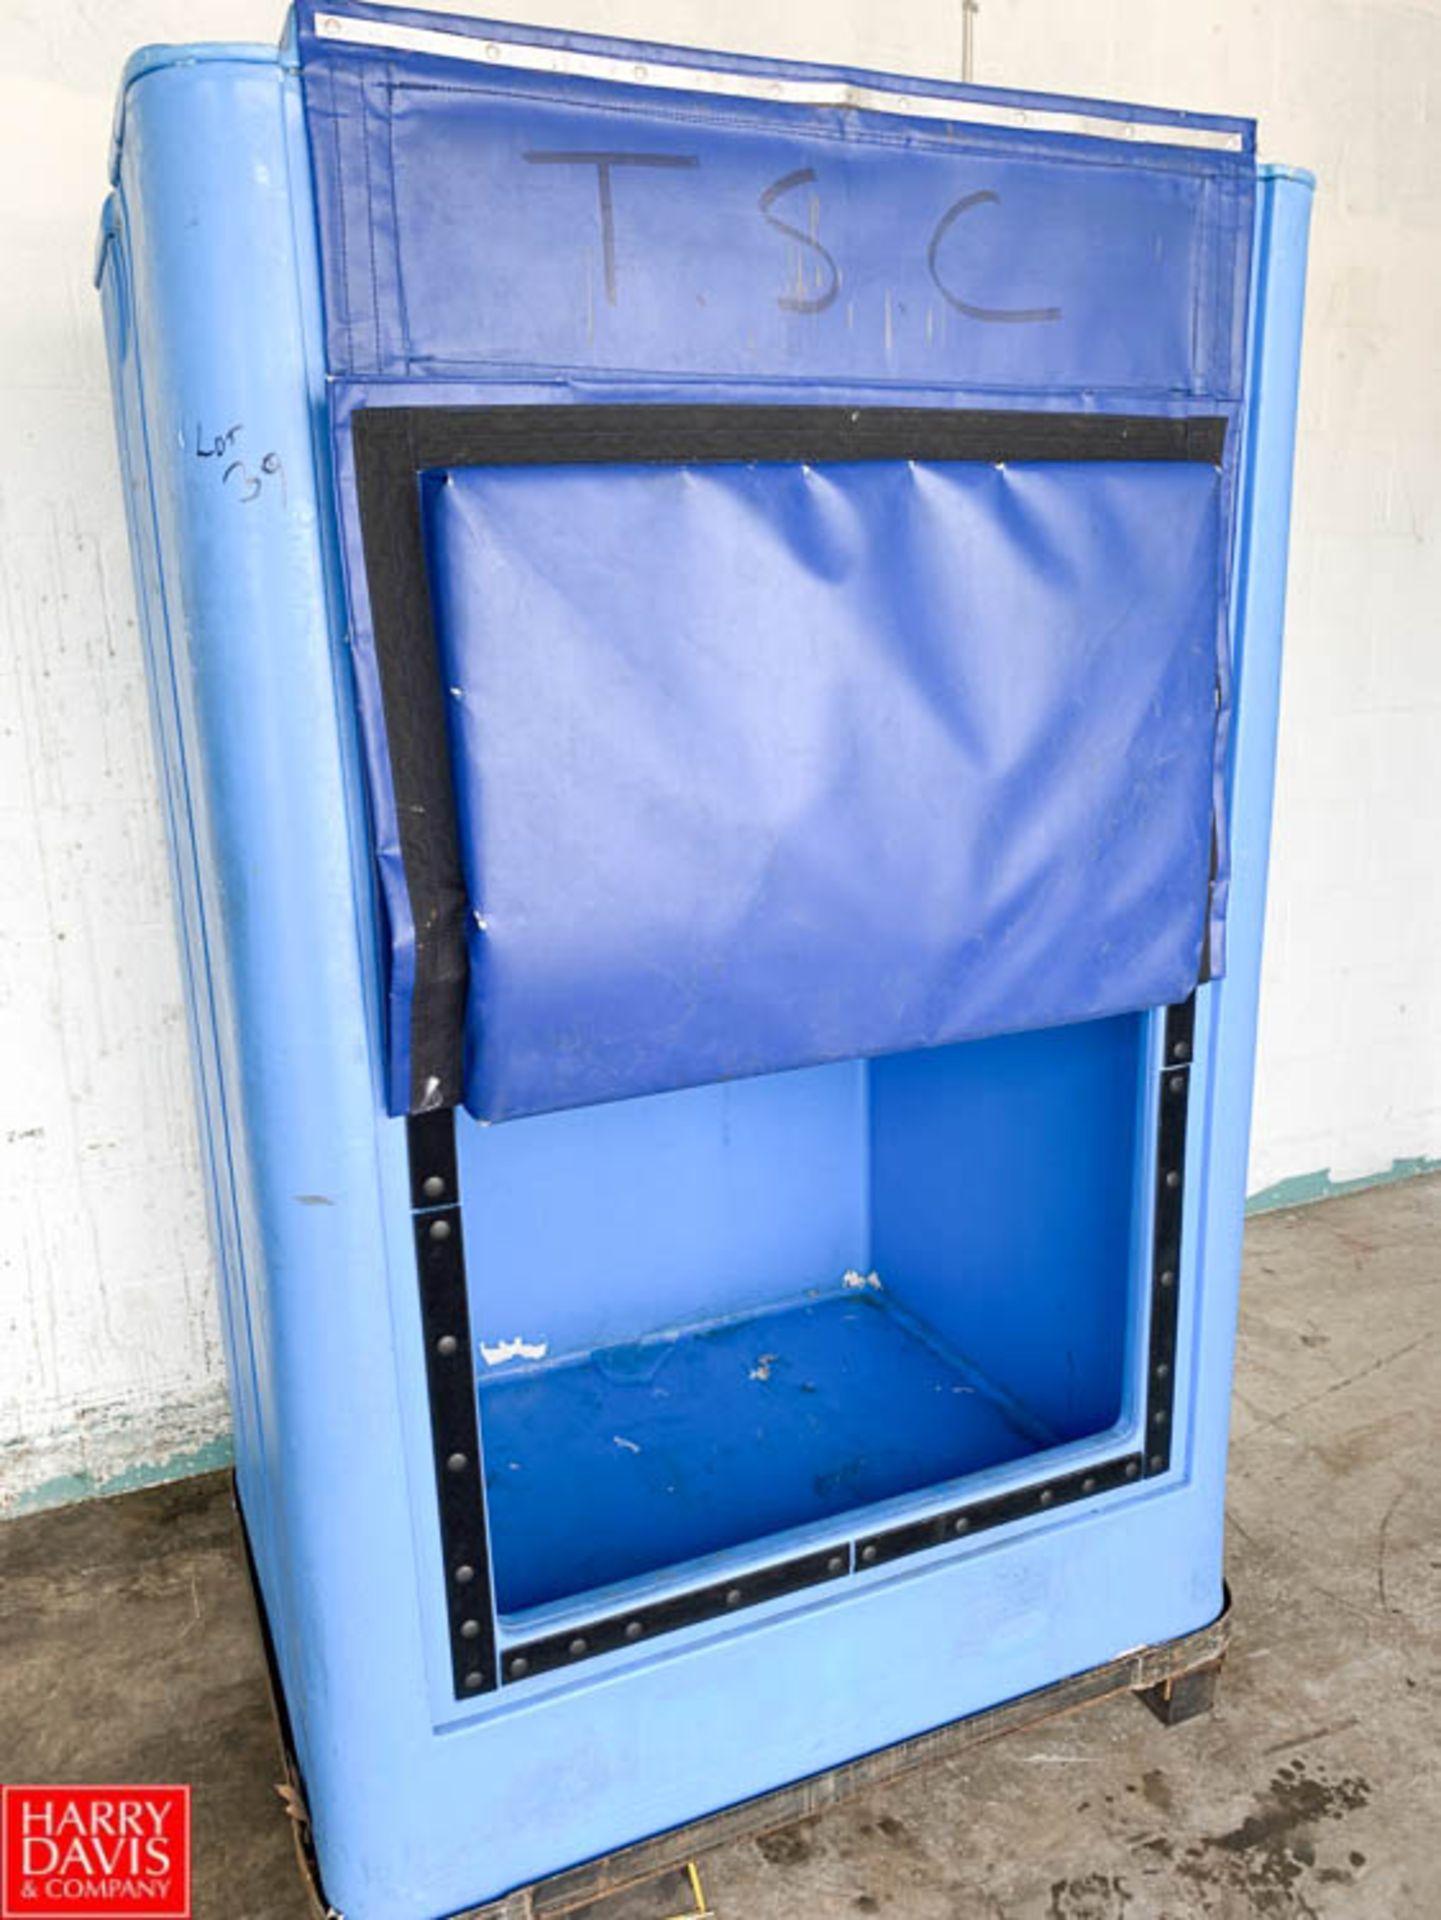 Lot 39 - Ice Cream Transfer Carts - Rigging Fee: $10